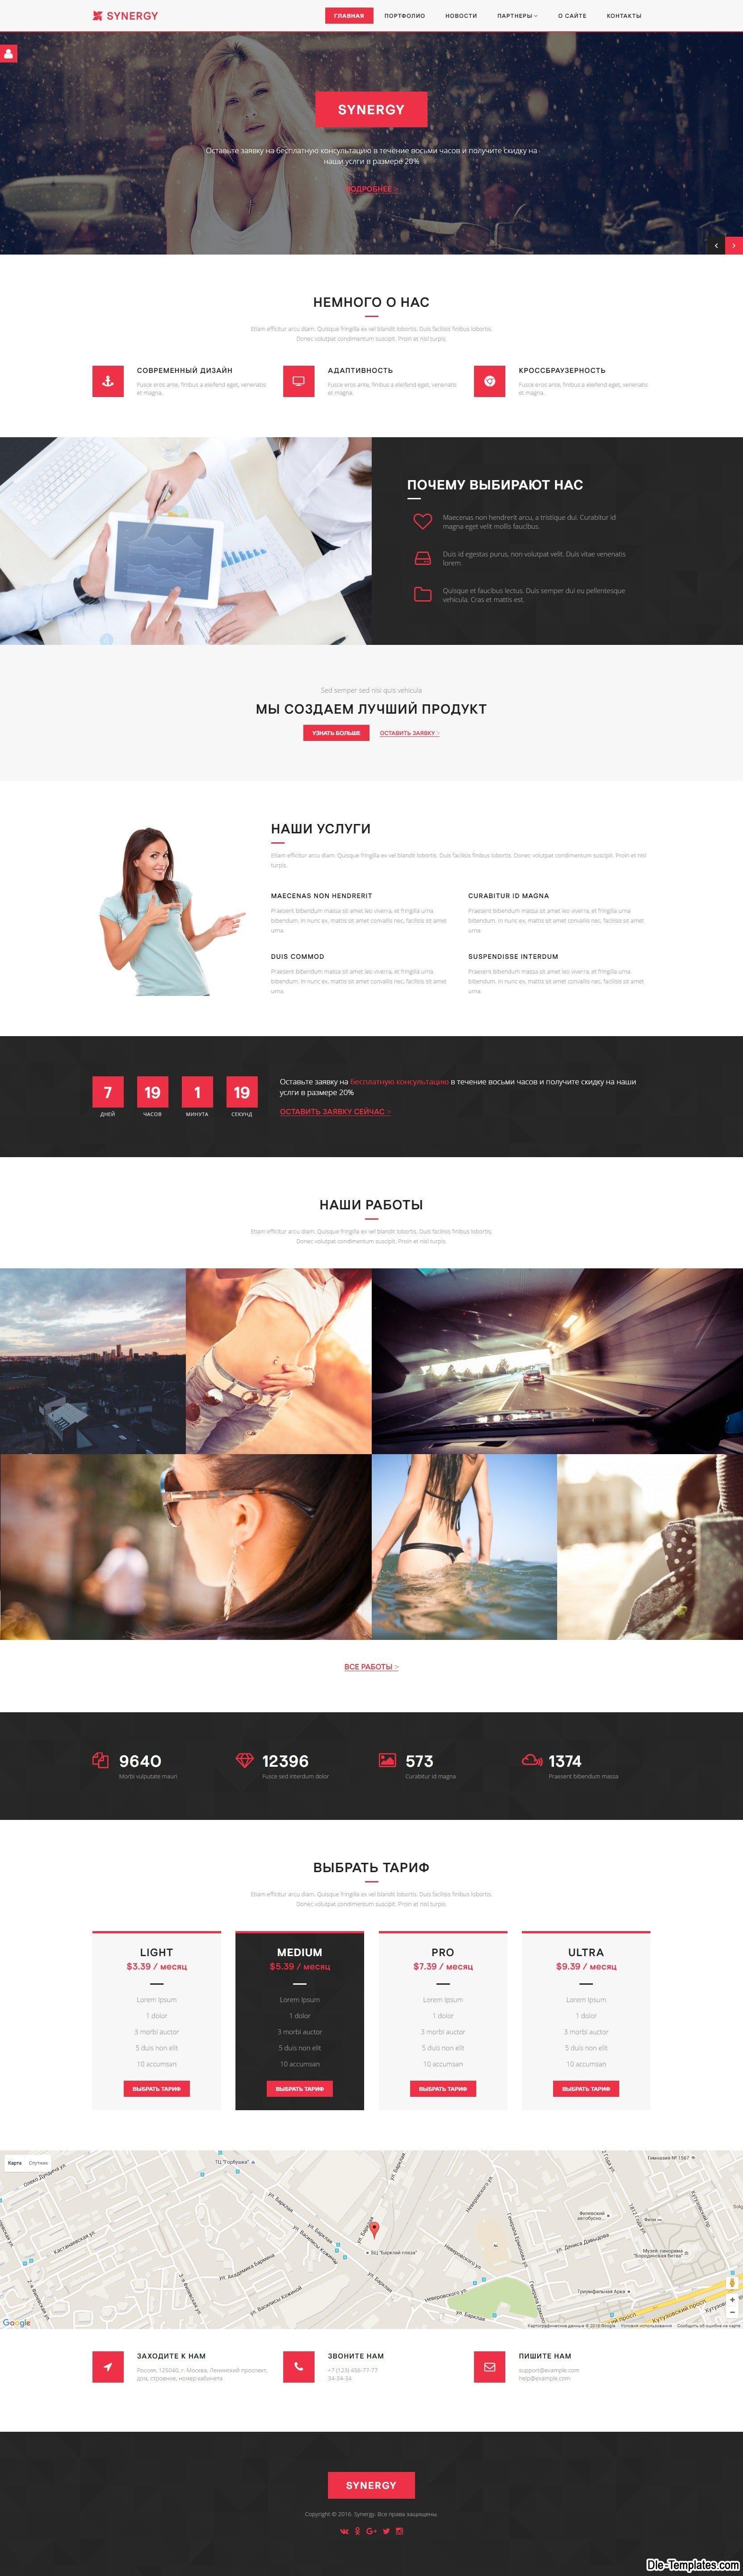 Synergy - адаптивный шаблон для сайта компании на DLE | Pinterest ...